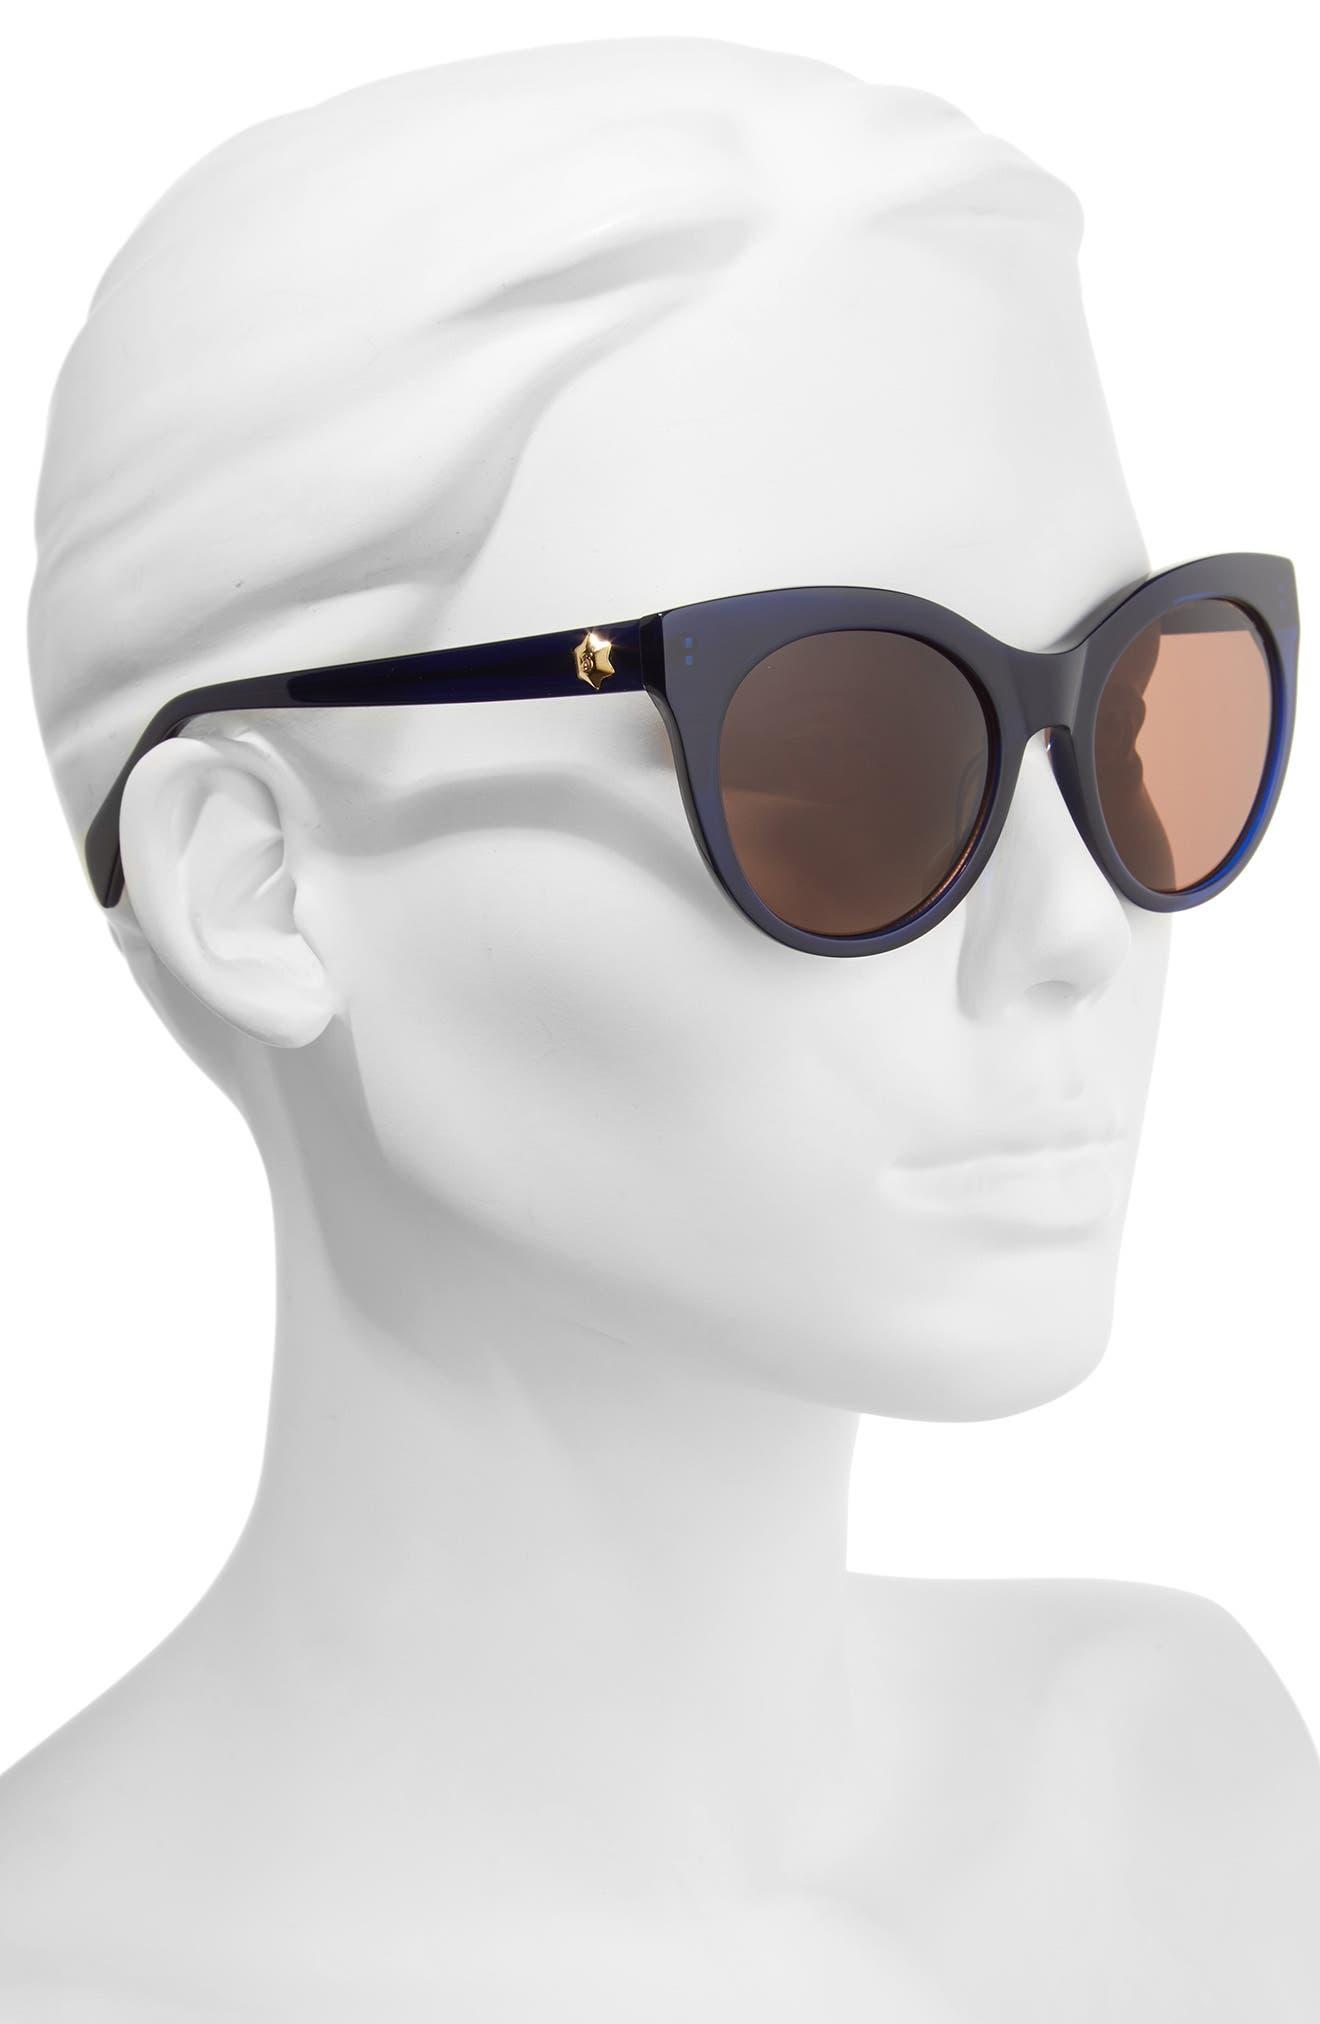 52mm Round Cat Eye Sunglasses,                             Alternate thumbnail 7, color,